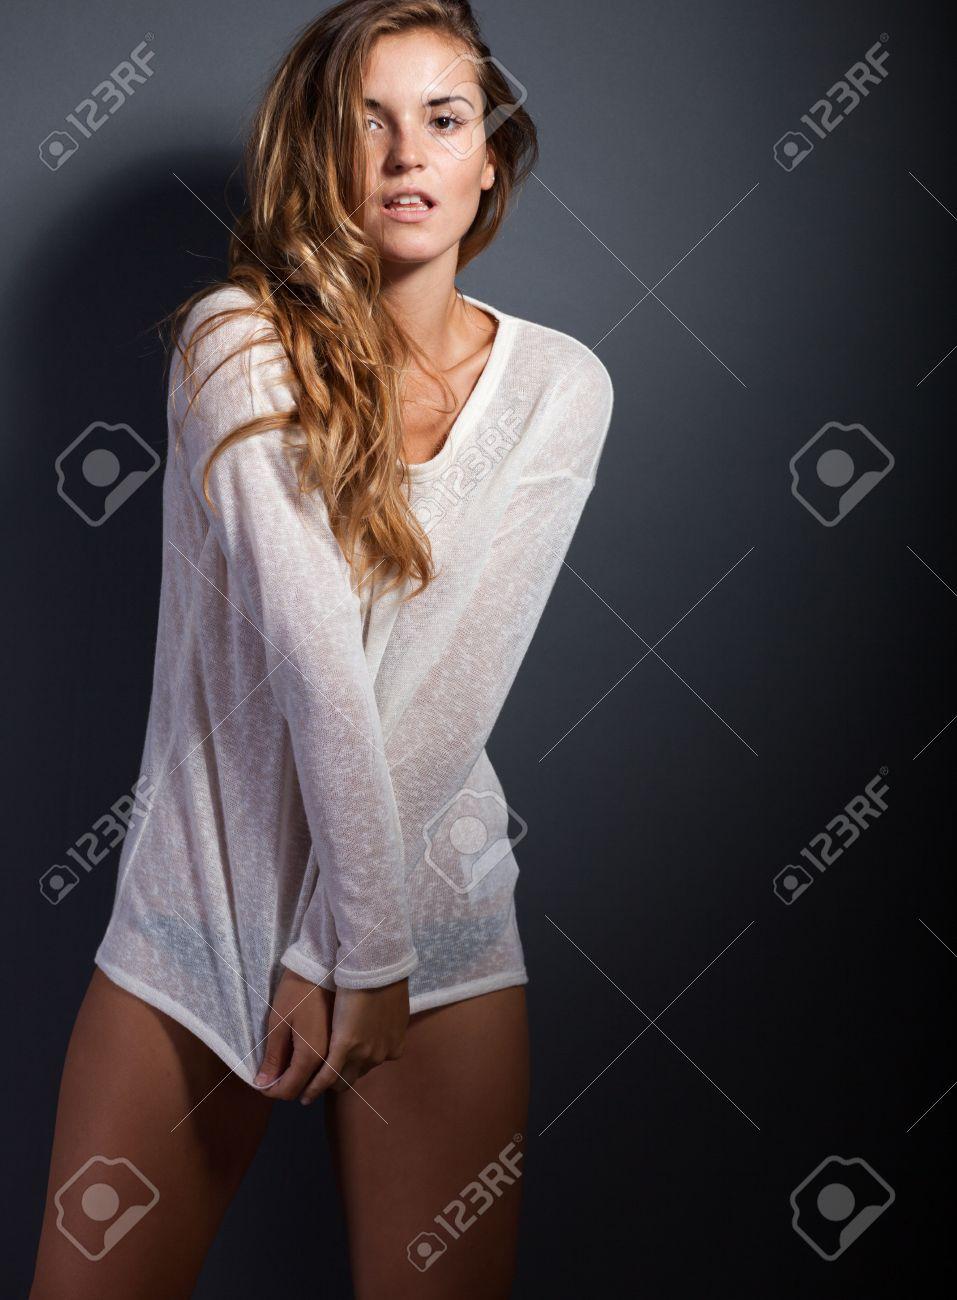 Pics of scarlett johansson nude